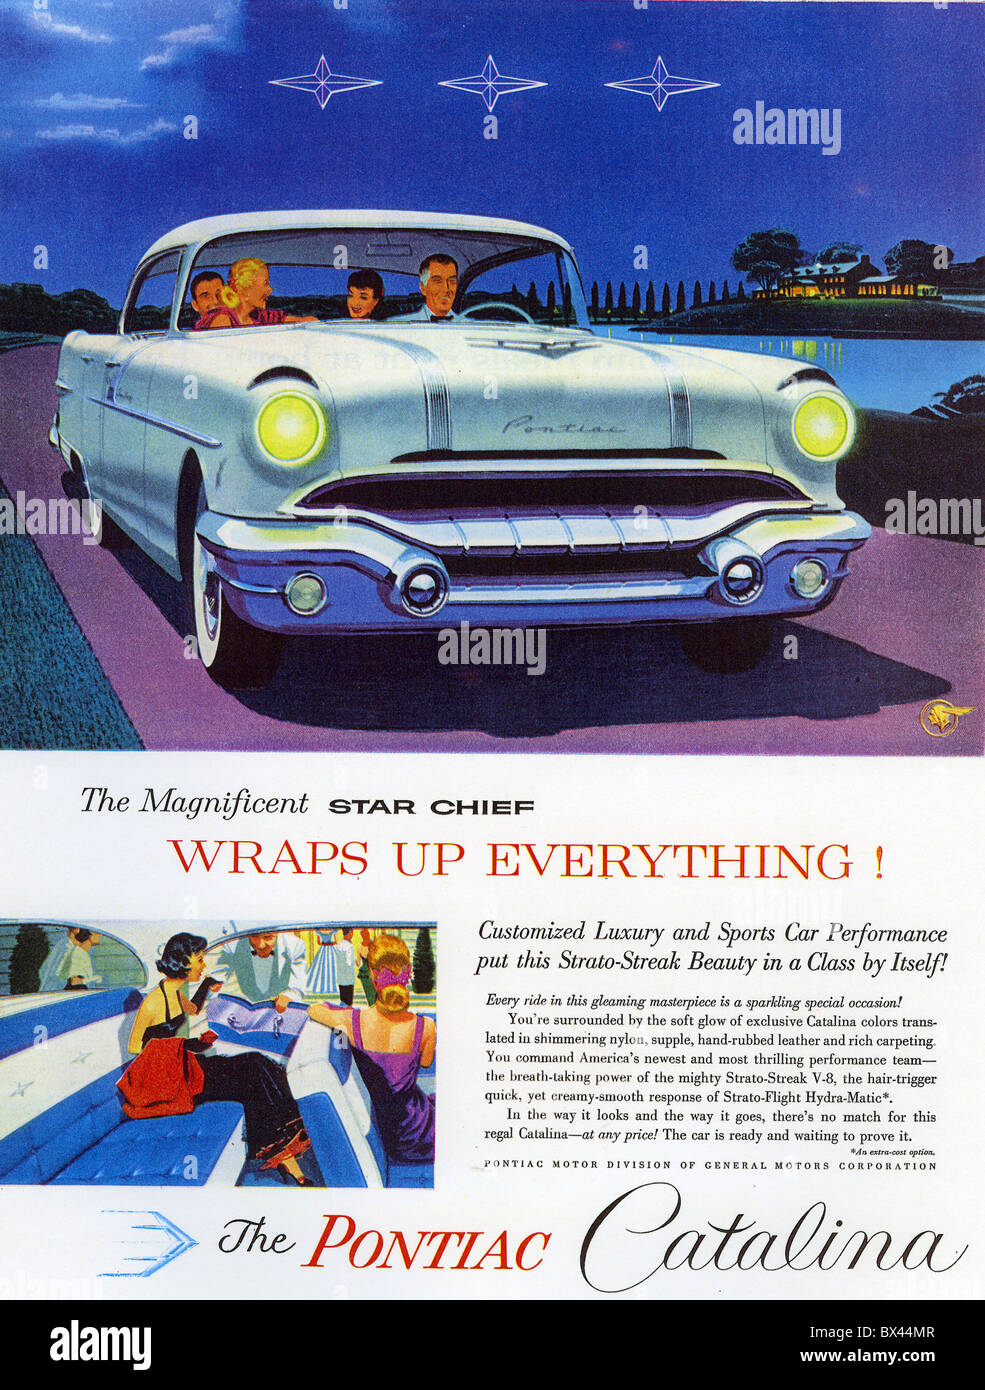 1956 PONTIAC CATALINA ADVERT Stock Photo